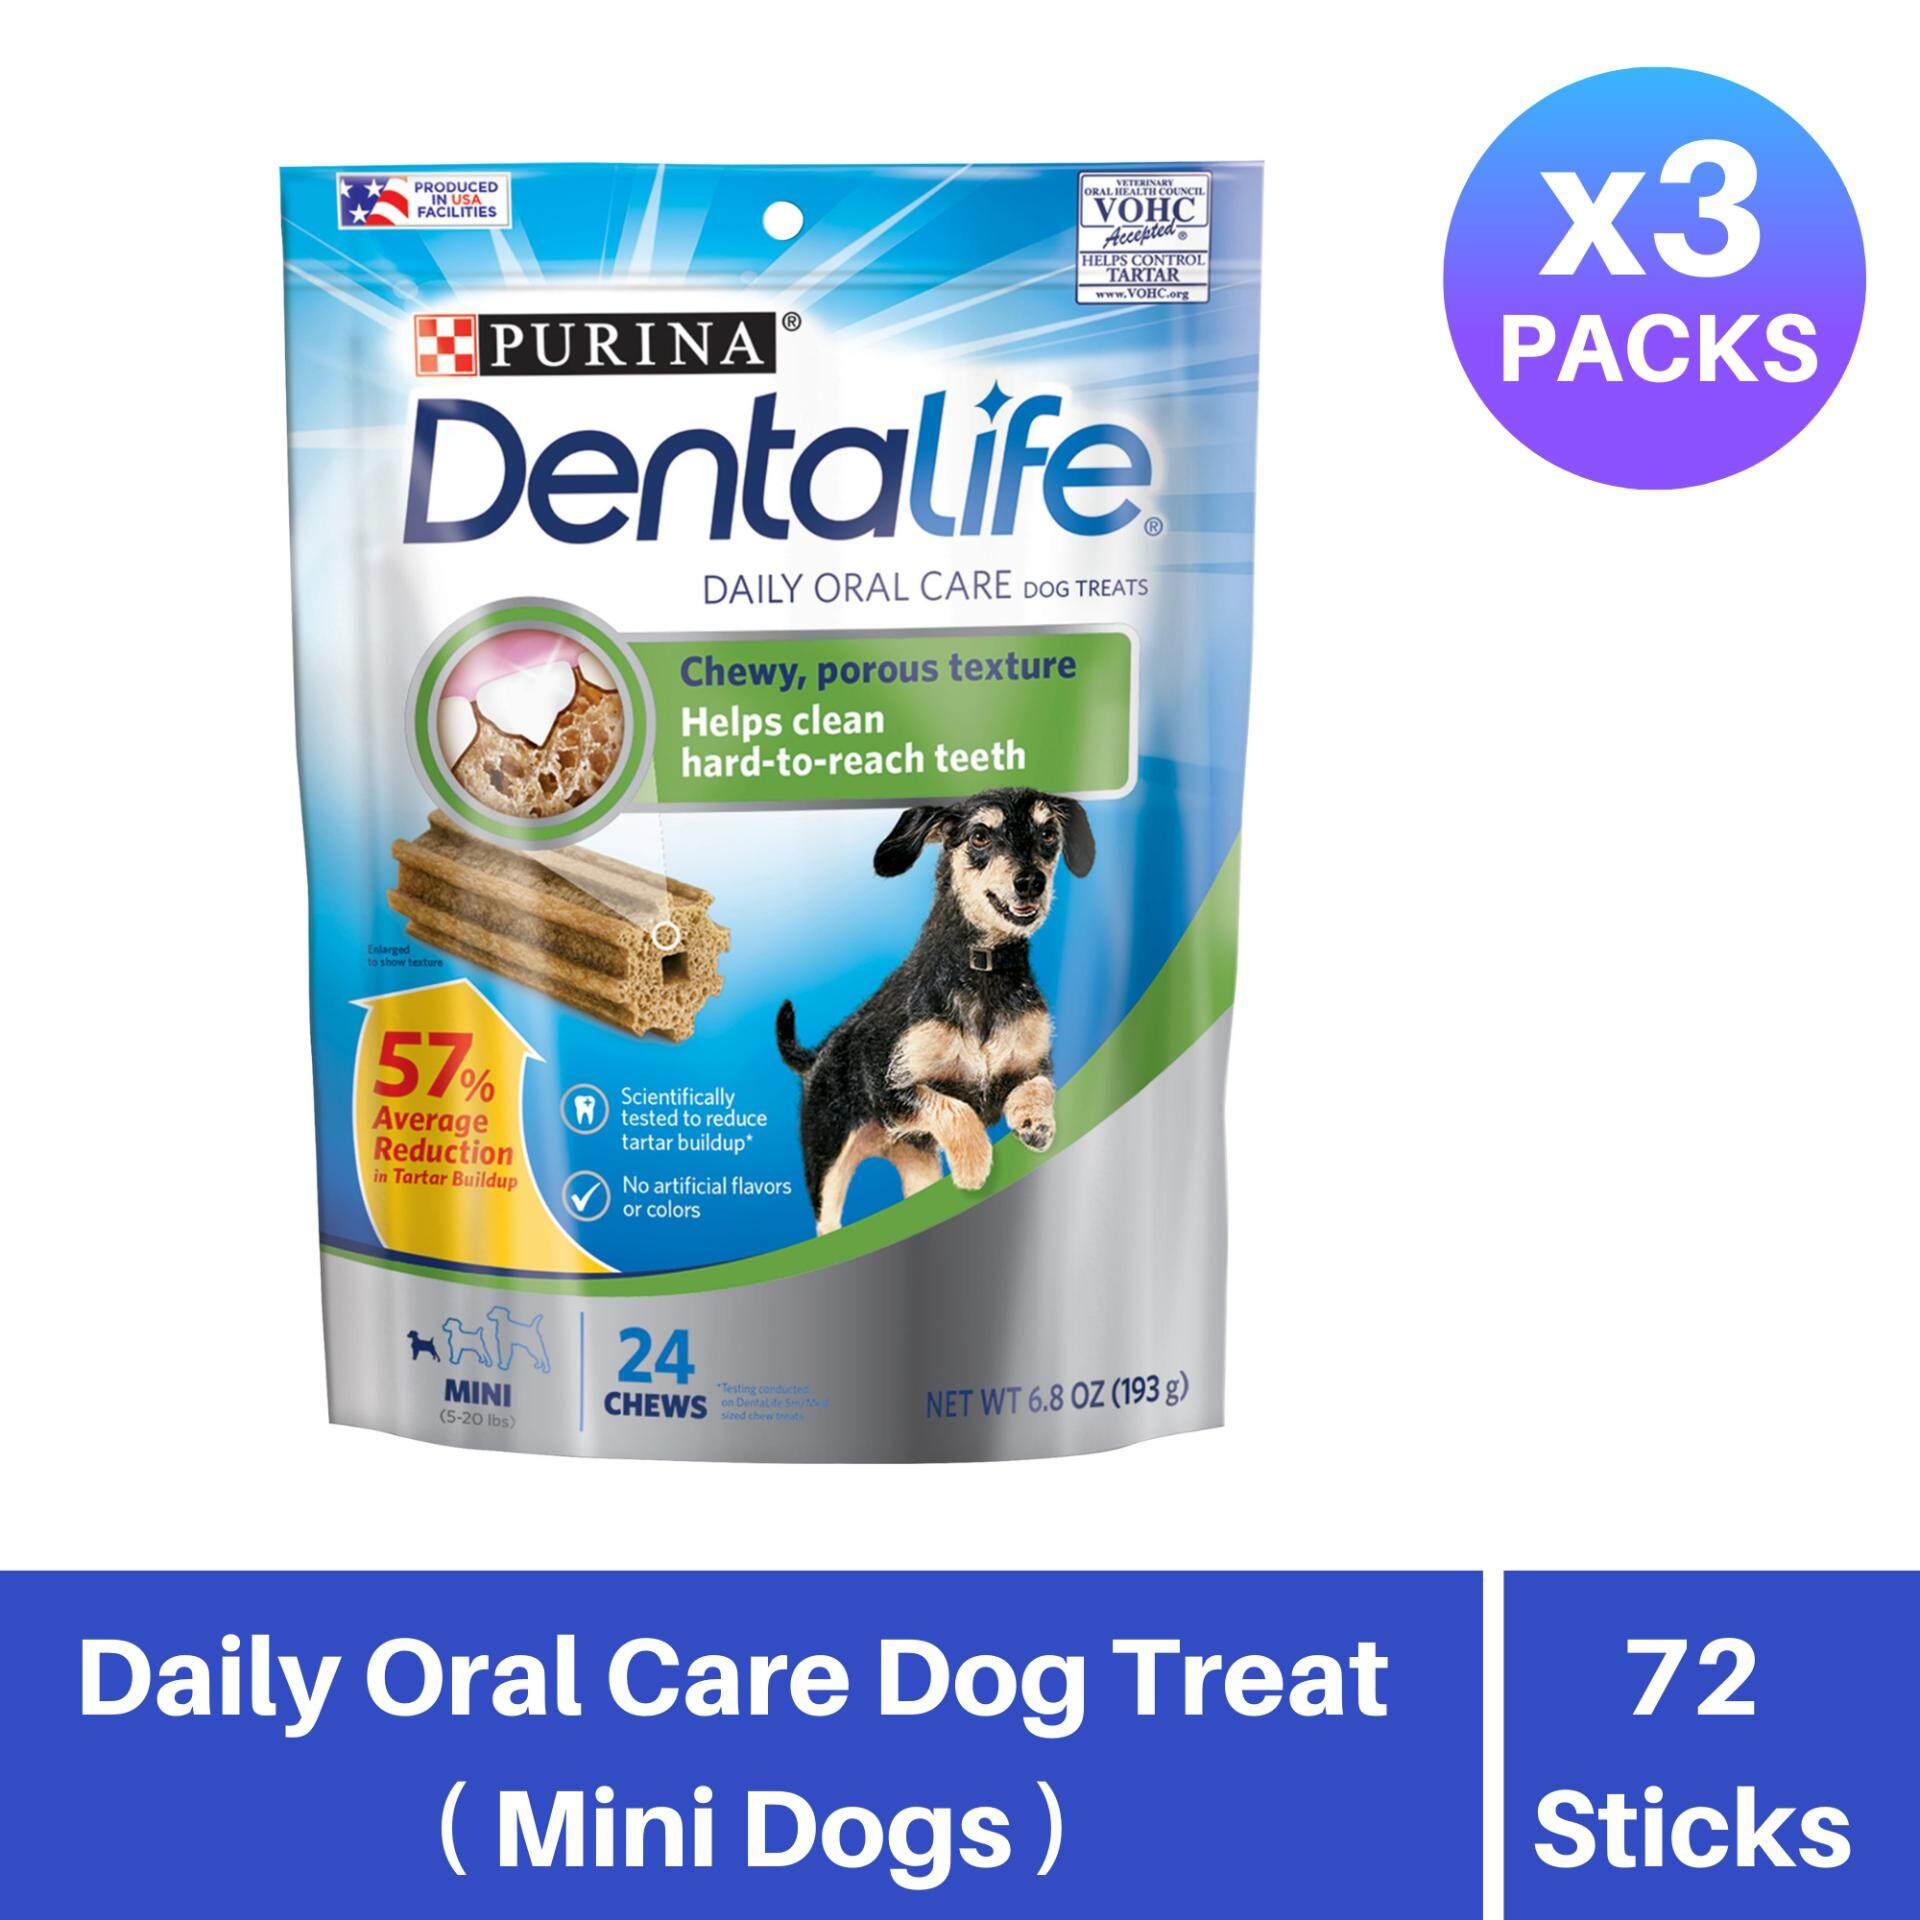 Dentalife Daily Oral Care Dog Treat for Mini Dogs 193g ( 3 x 24 Chews) - Pet Food/ Dry Food/ Dog Food/ Makanan Anjing